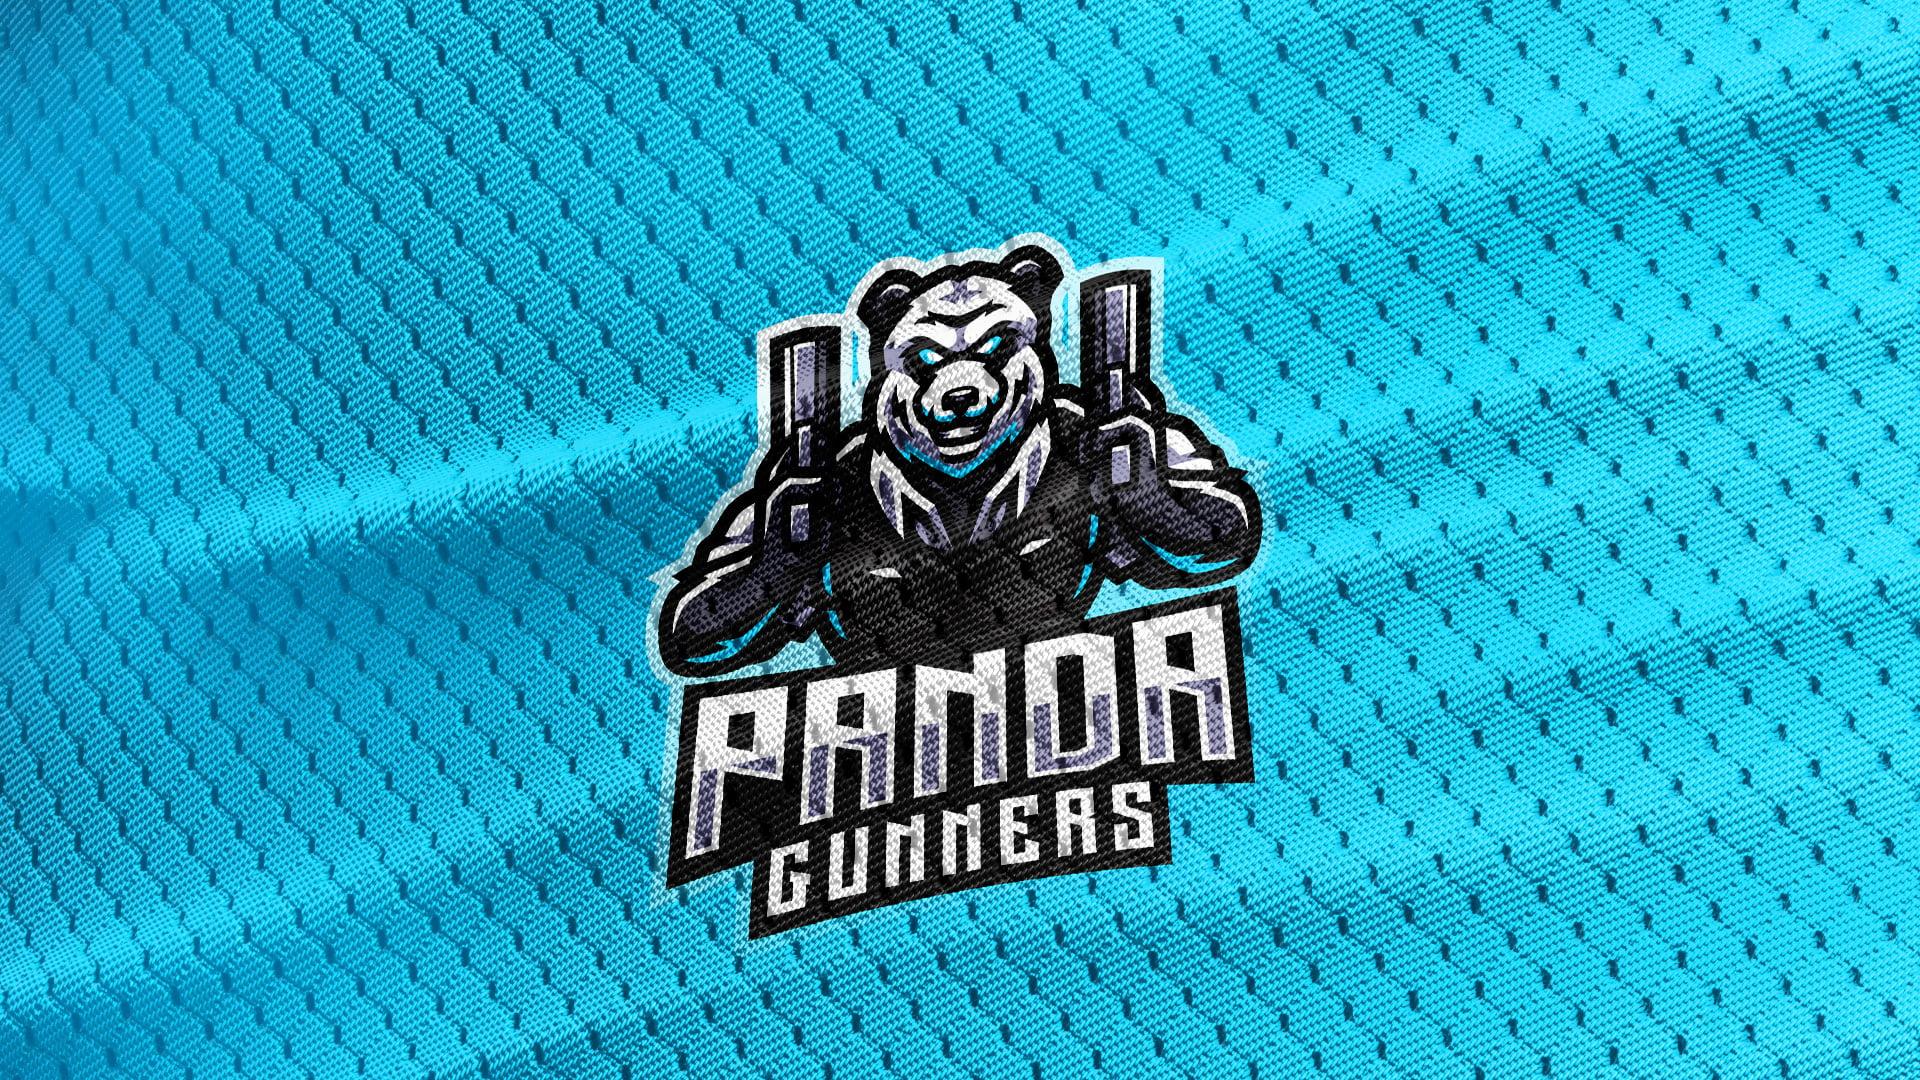 Cyan-Jersey-Texture-Free-Download-Panda-Bear-Mascot-Logo